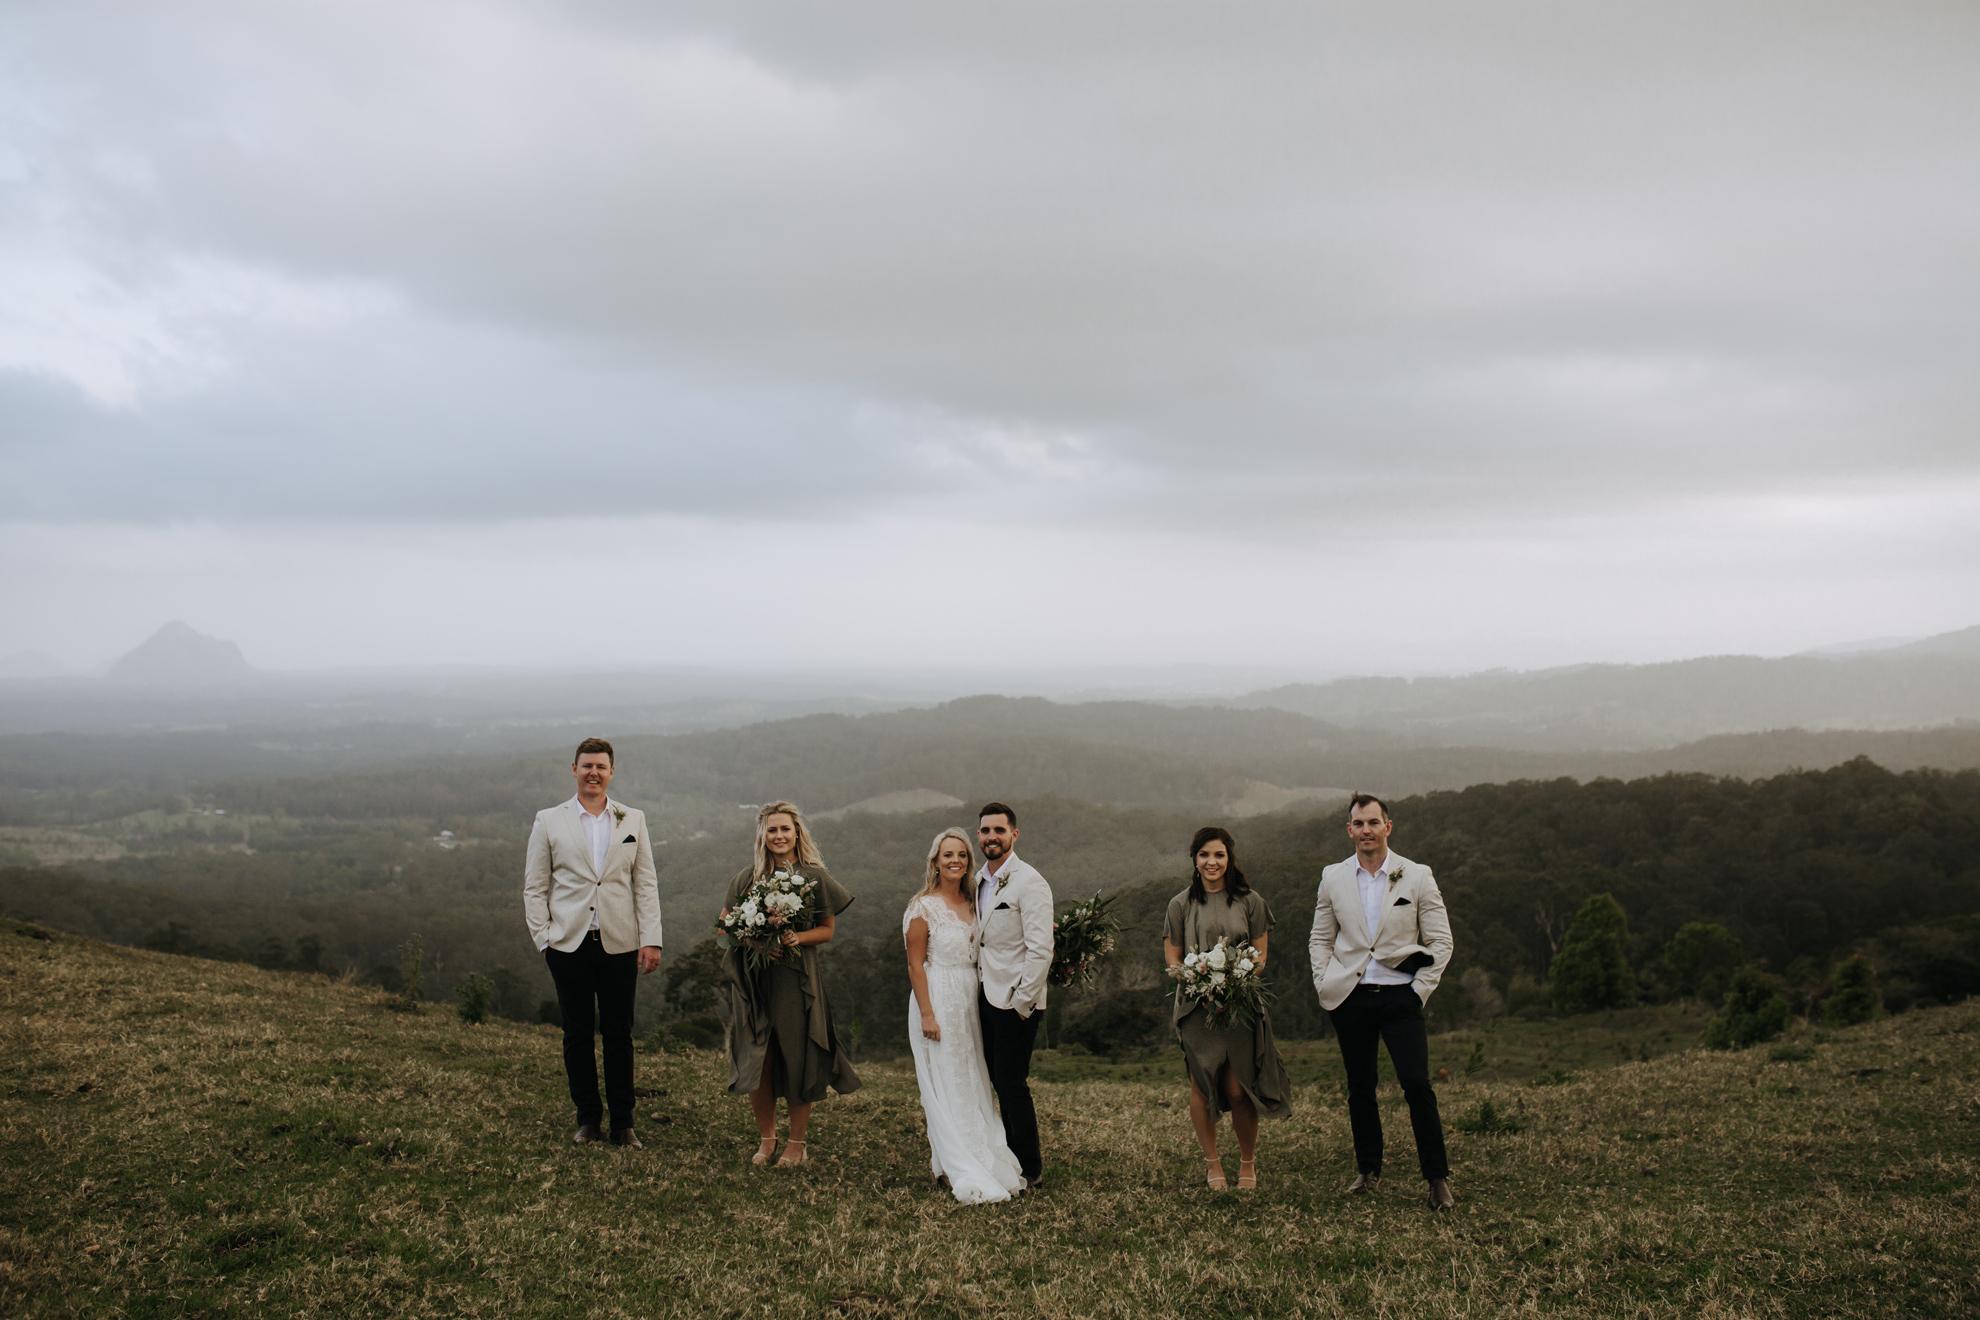 073-Kirby_Lewis_Maleny_Manor_Wedding.jpg